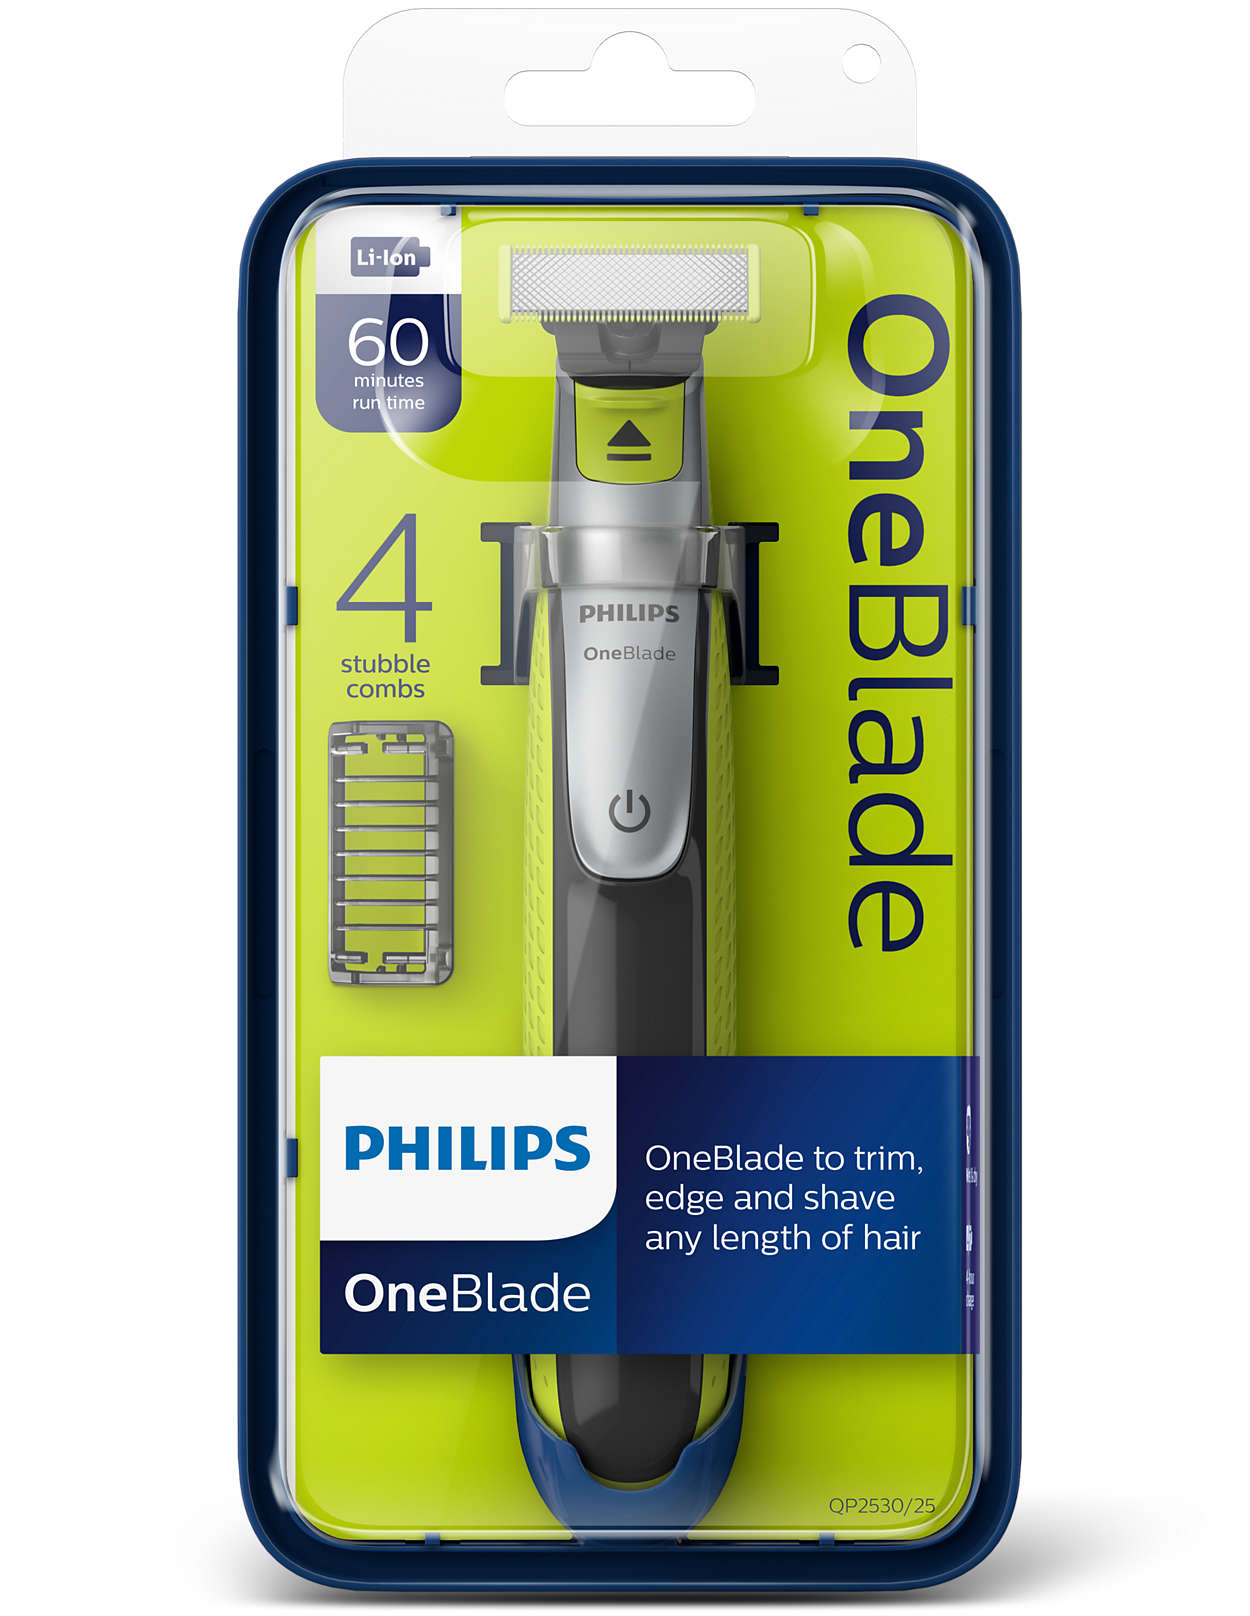 philips oneblade electric trimmer styler shaver 4x combs wet dry qp2530 25 ebay. Black Bedroom Furniture Sets. Home Design Ideas